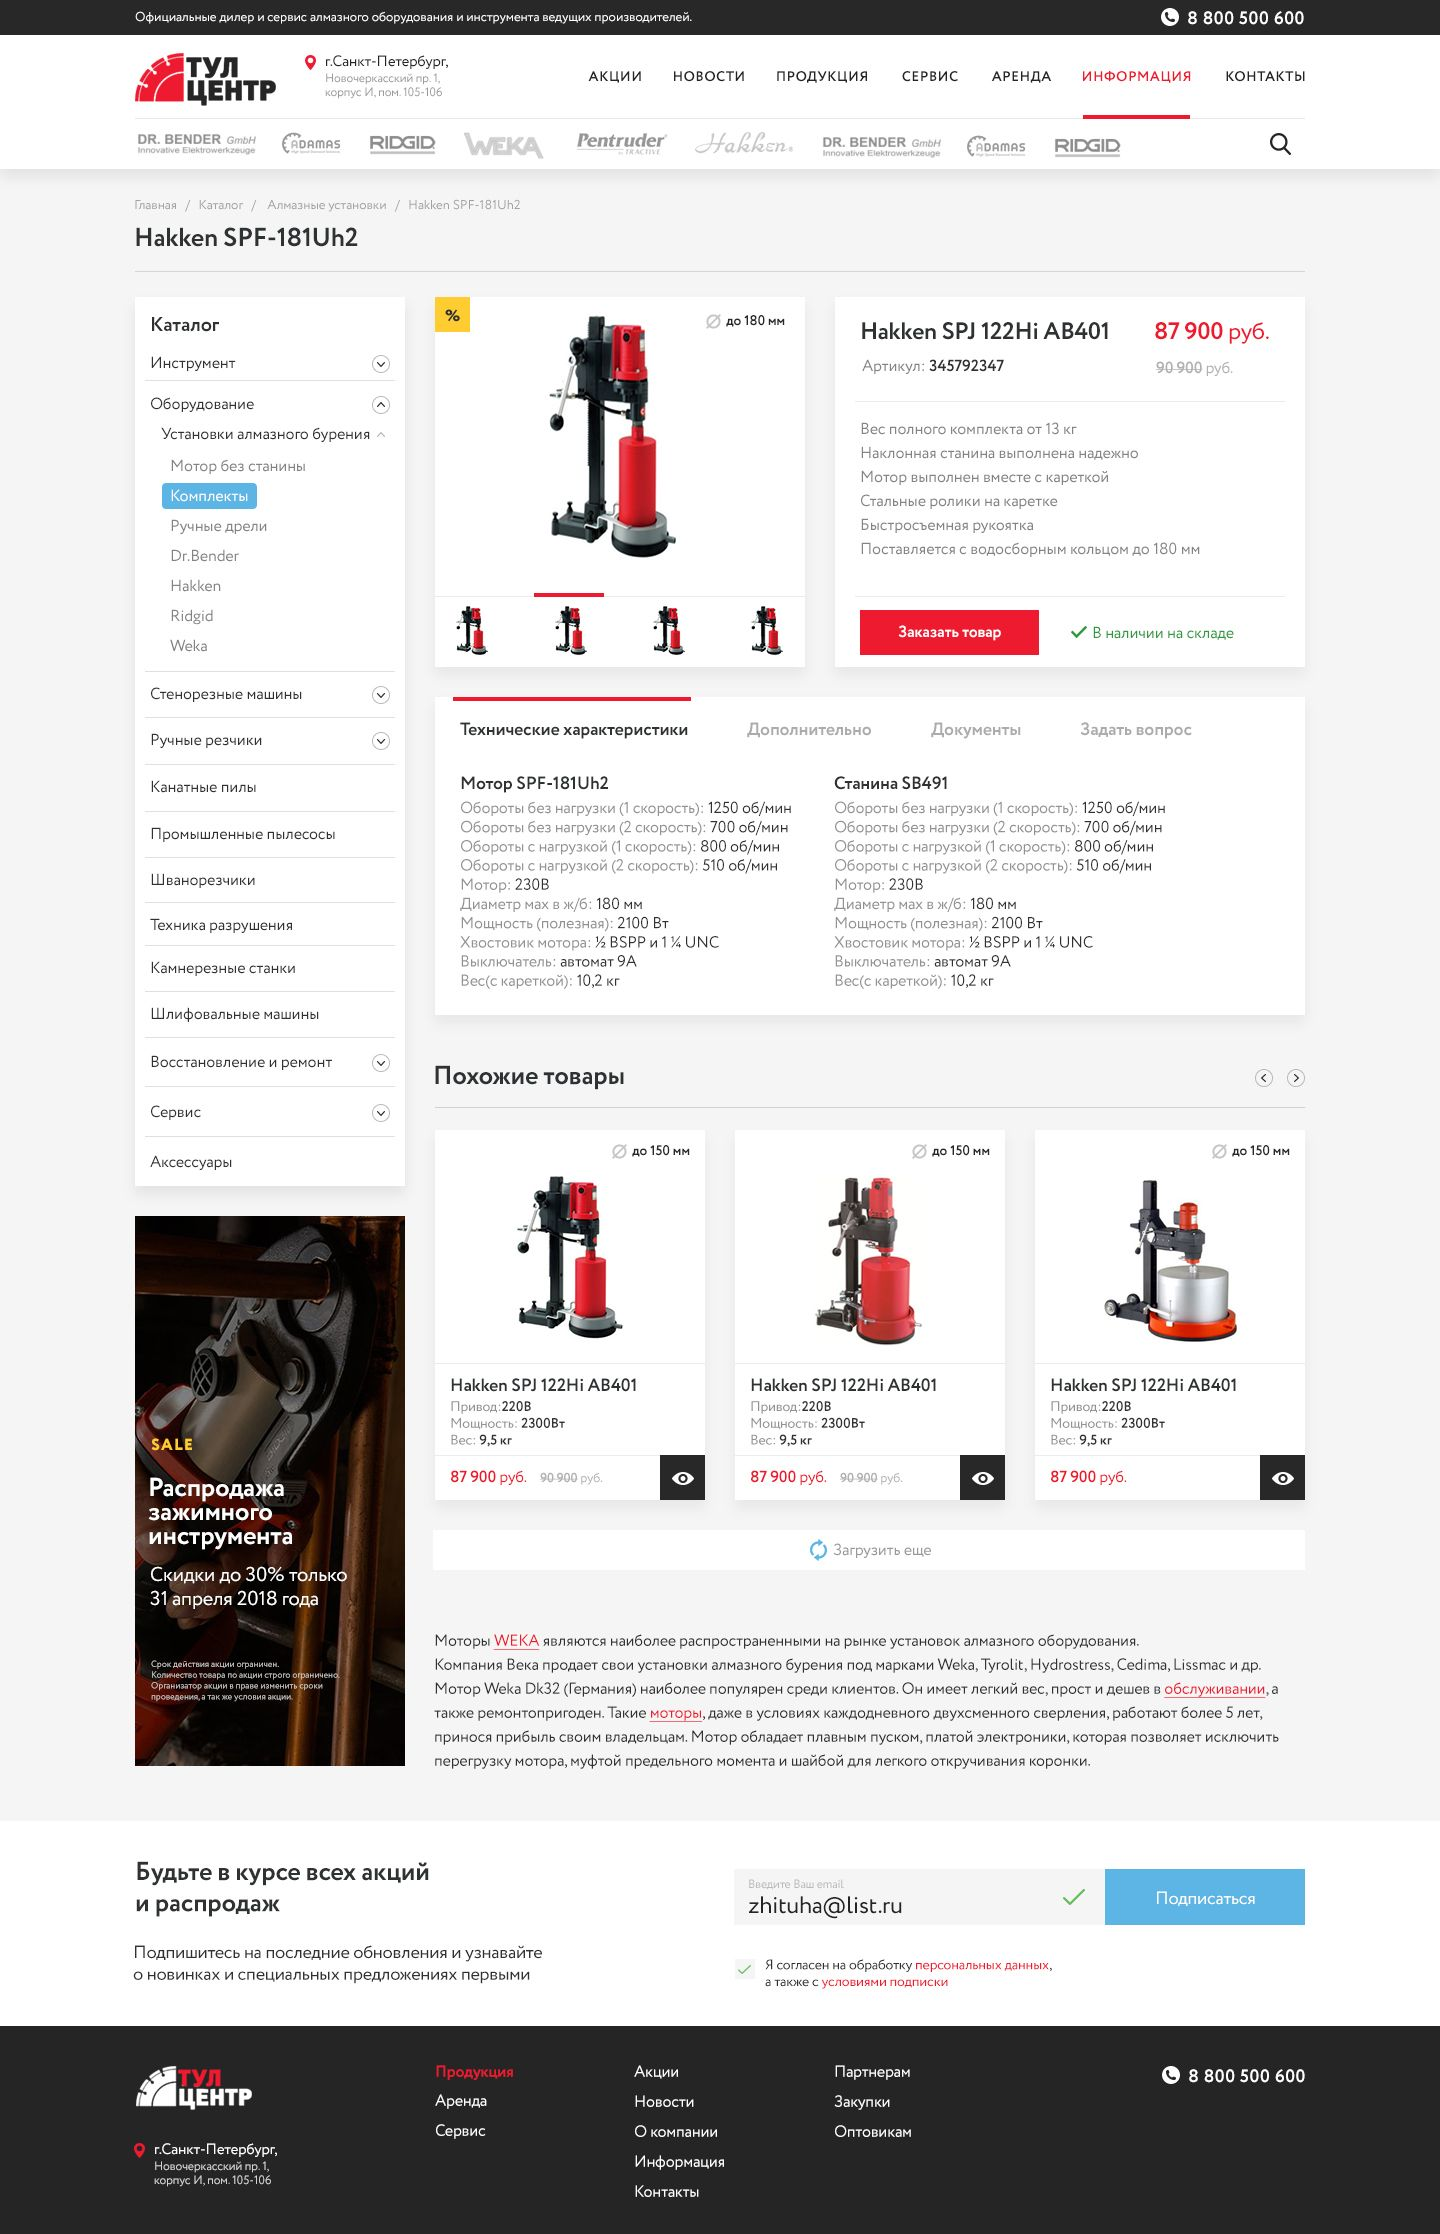 Веб-сайт для Тул Центр - дизайнер zhituha